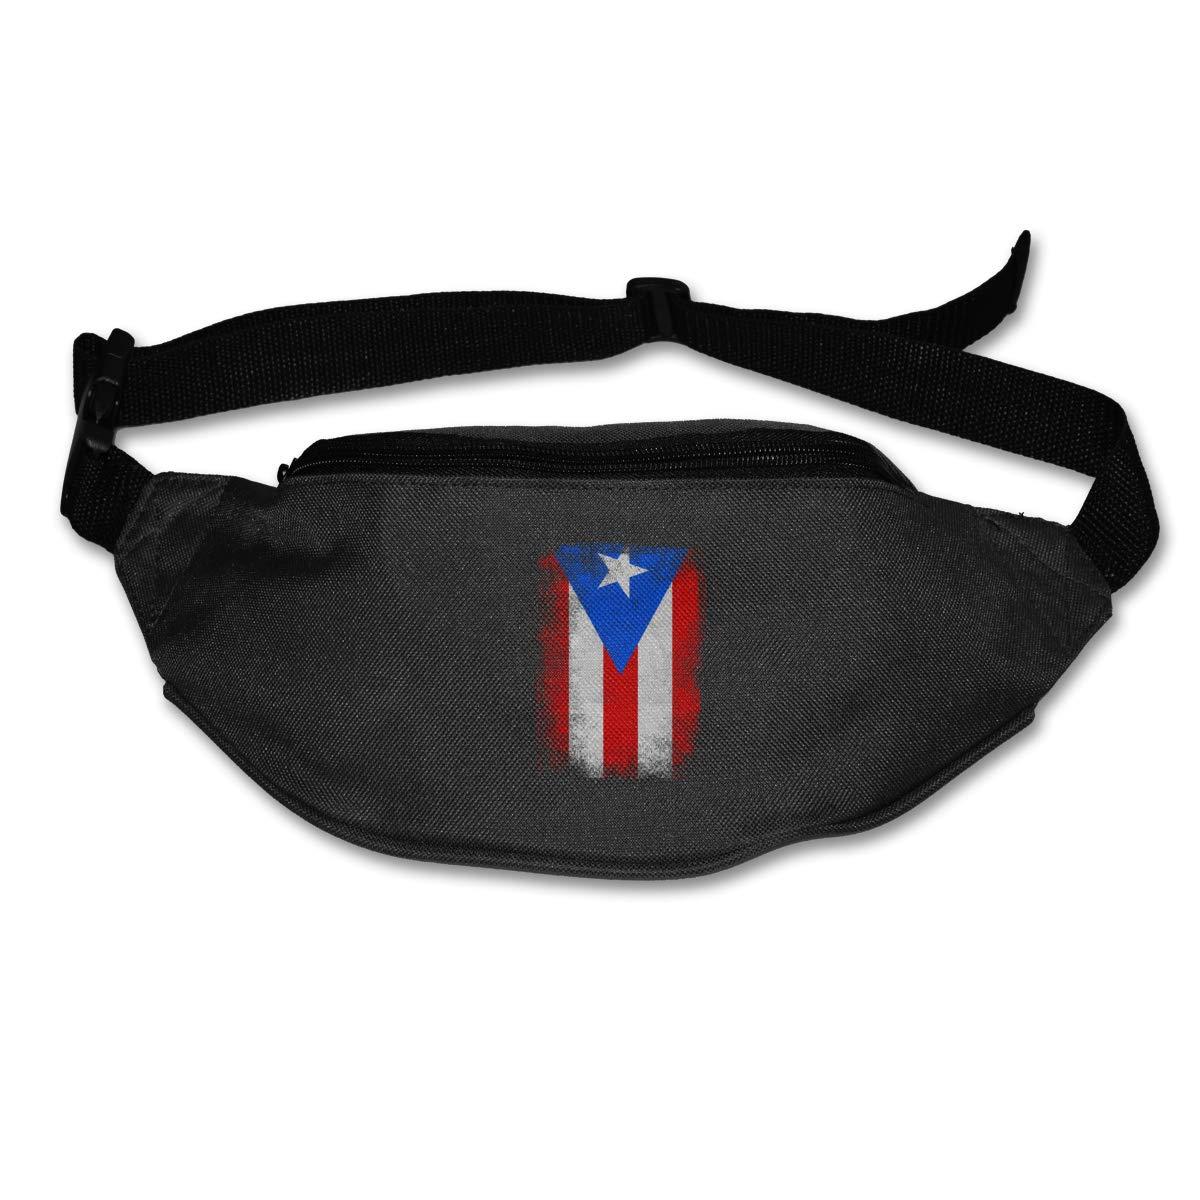 Puerto Rico Flag Sport Waist Bag Fanny Pack Adjustable For Hike